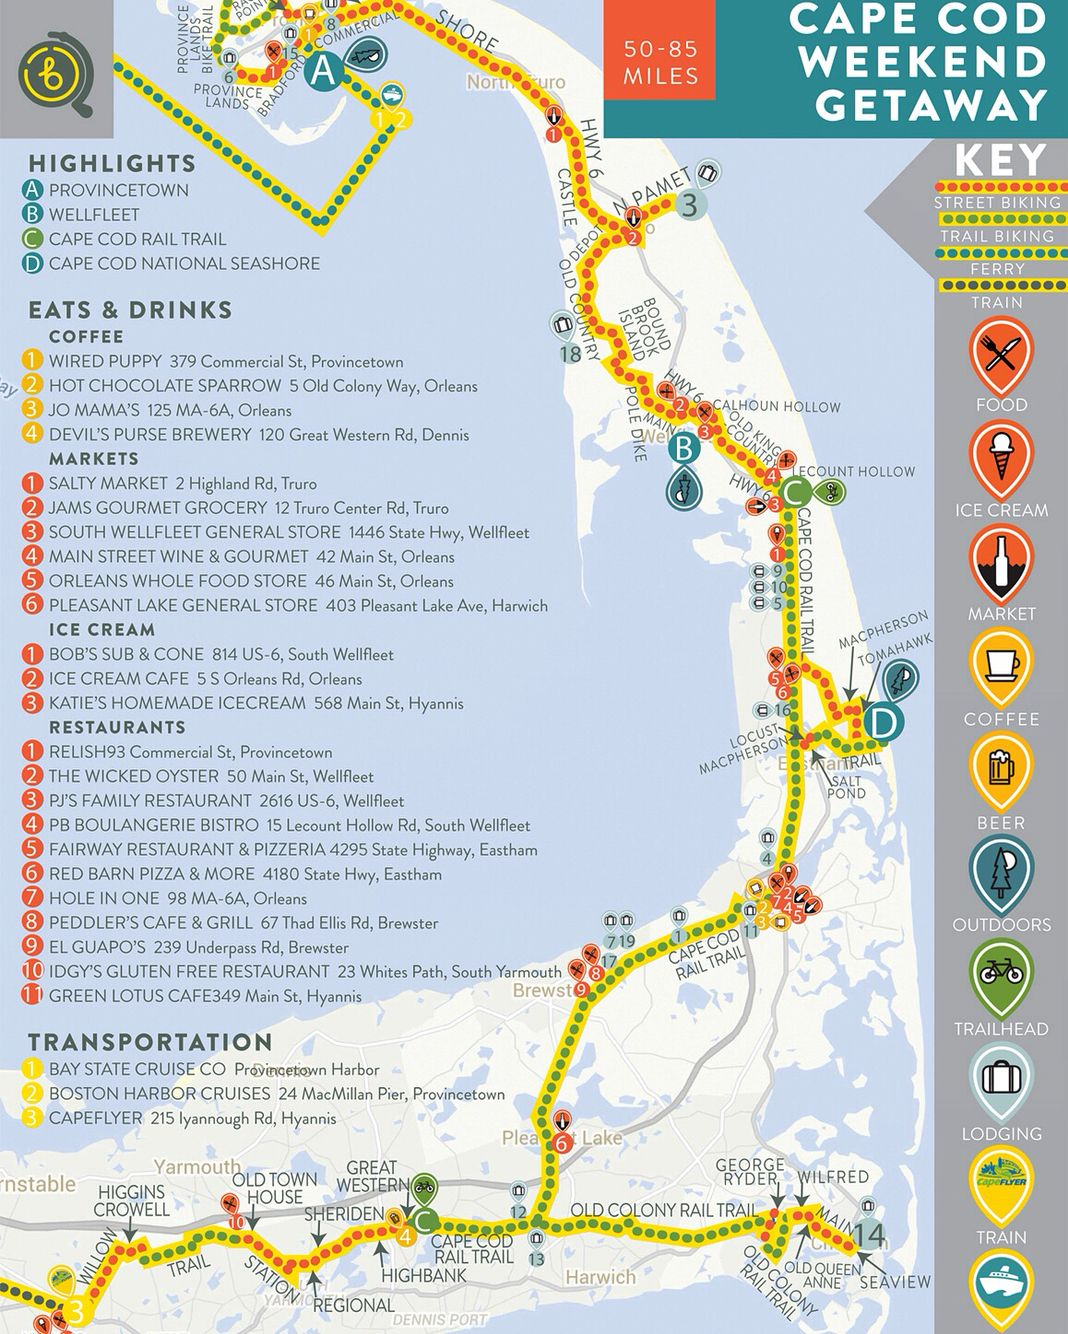 Cape Cod Weekend Getaway By Bike, Ferry And Train